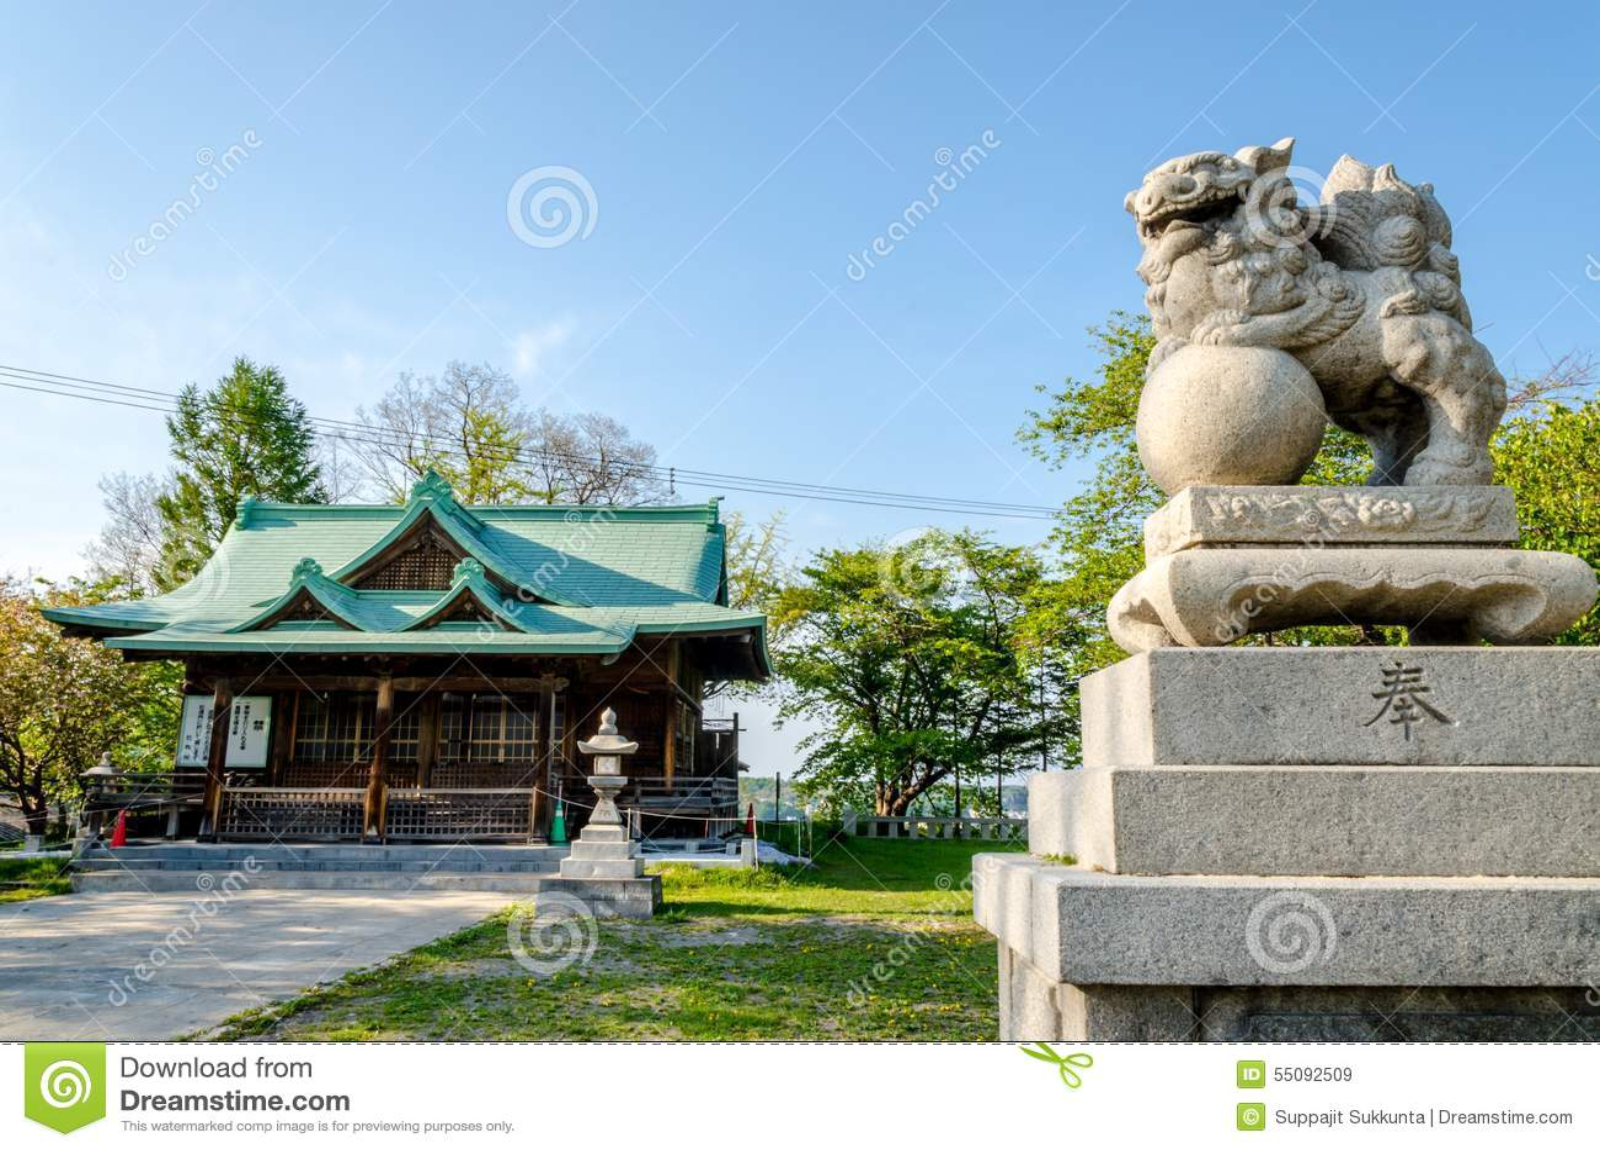 Suitengu shrine the temple of shinto religion at Otaru, Hokkaido